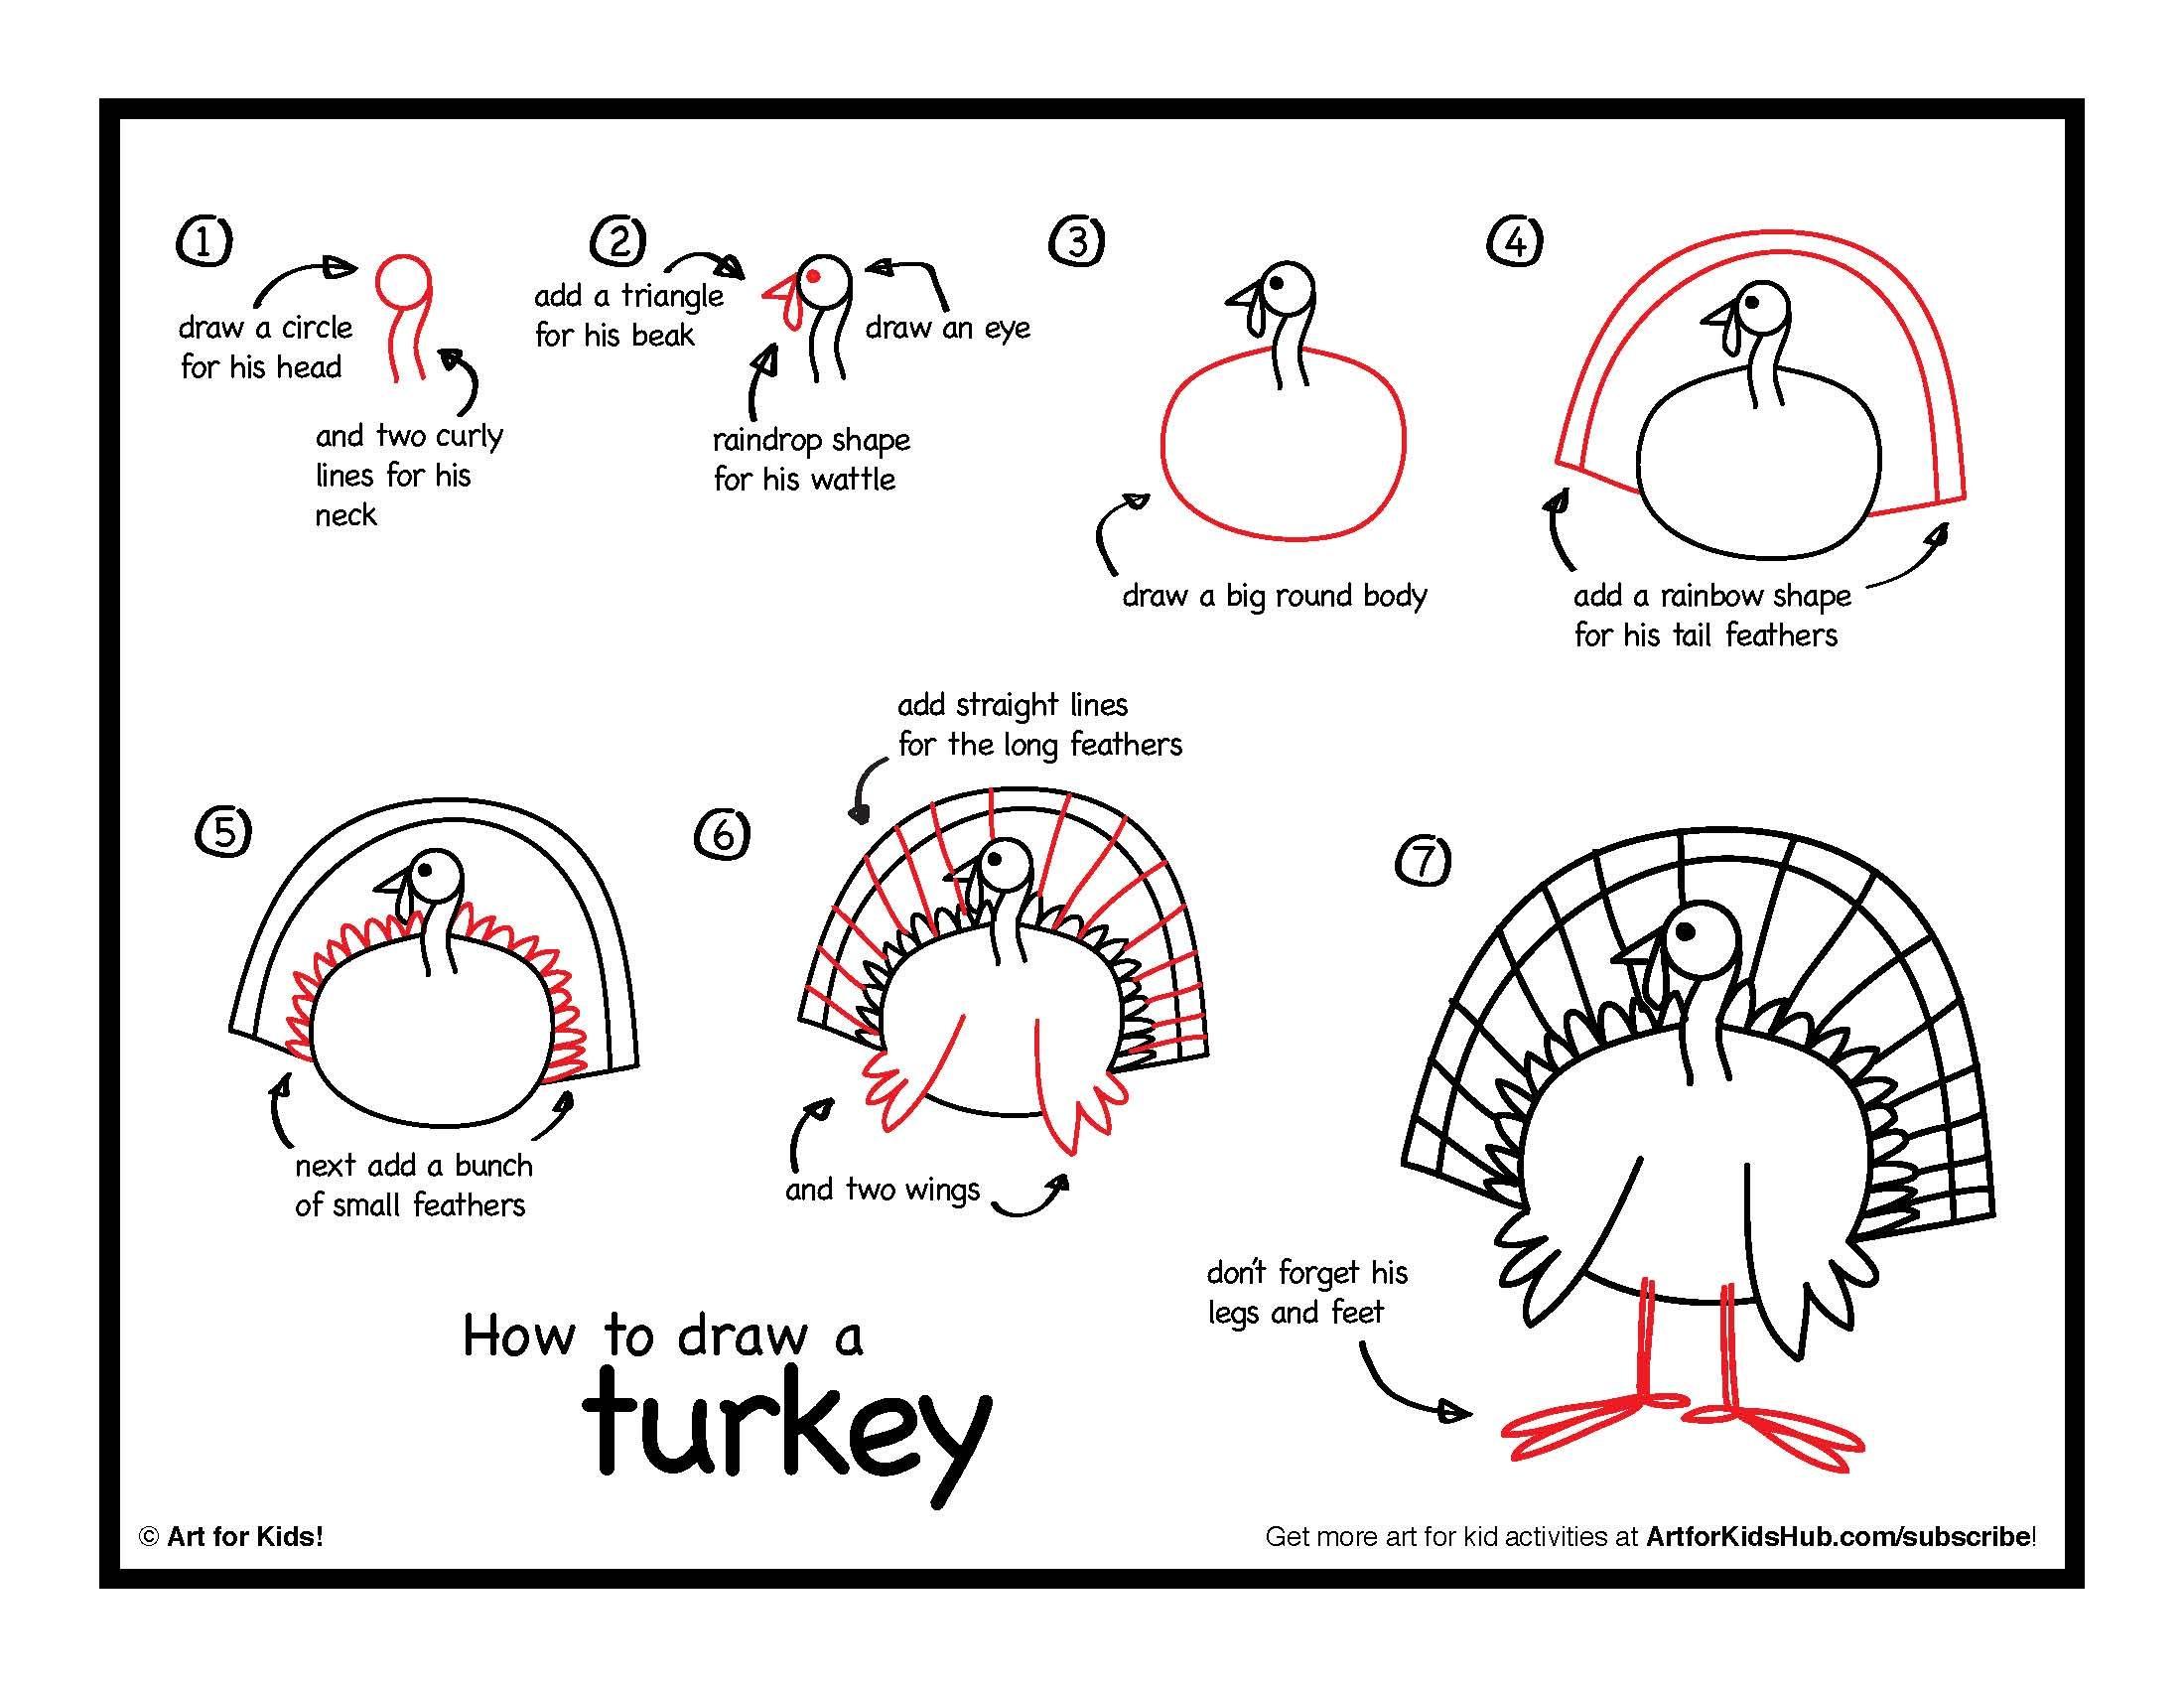 How To Draw A Turkey Art For Kids Hub Art For Kids Hub